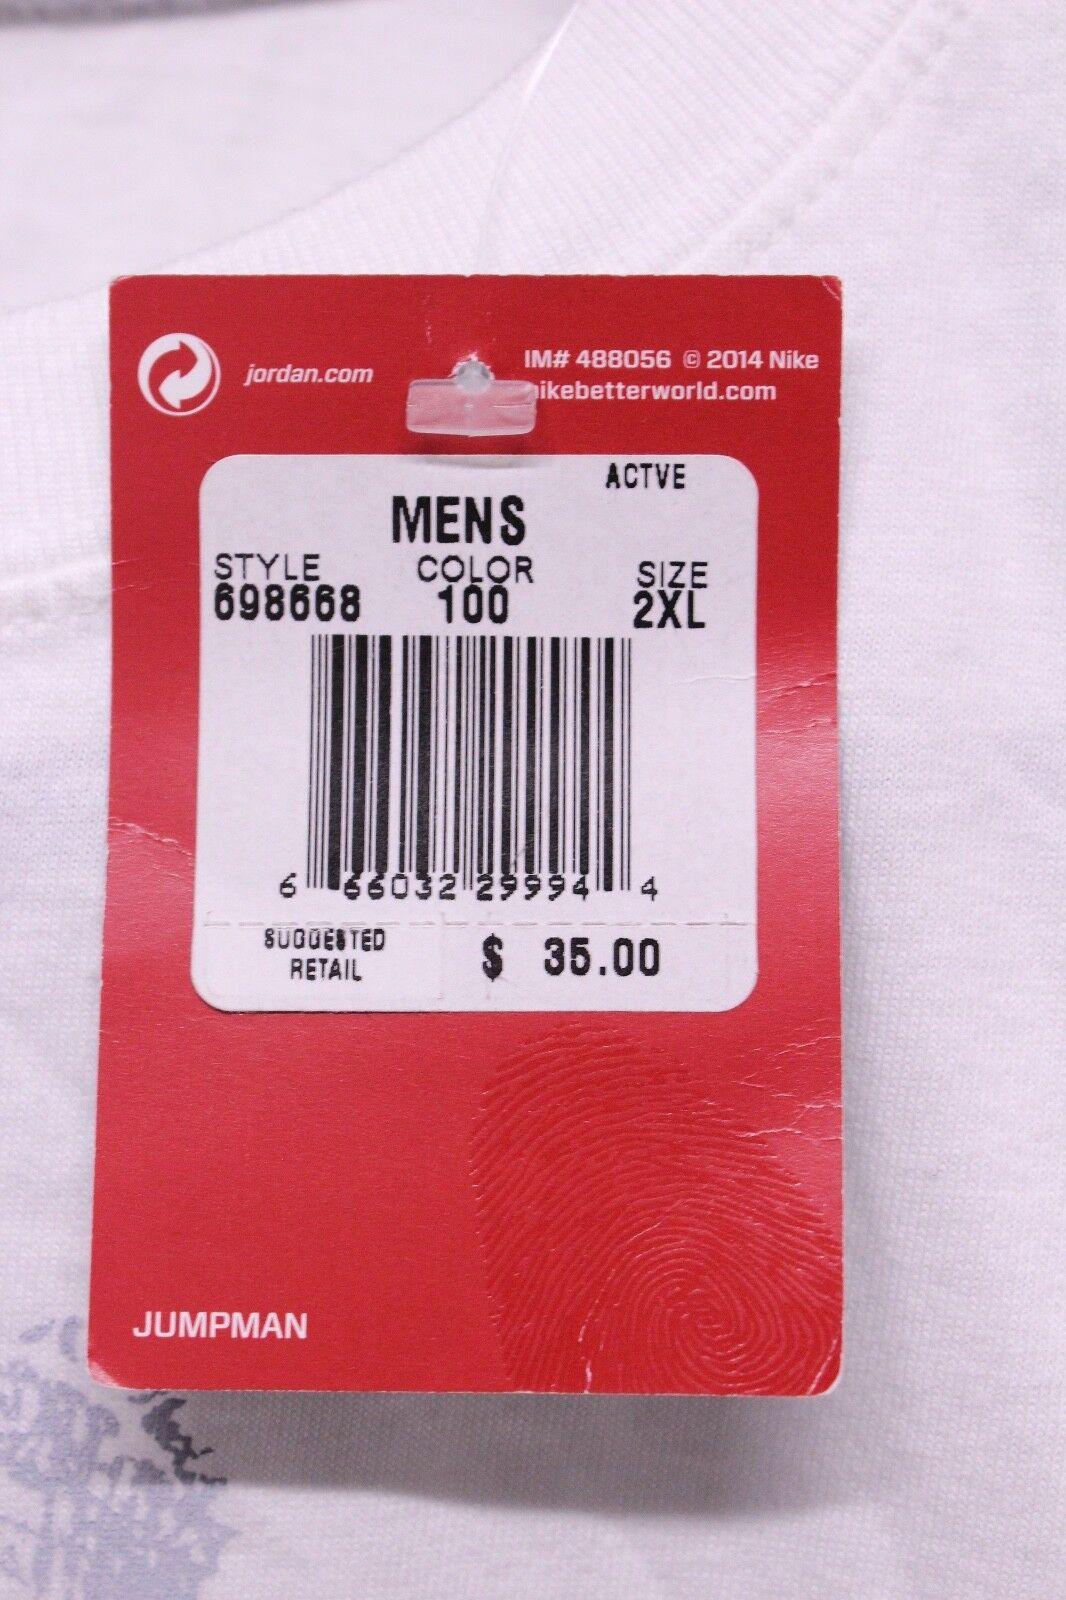 Air Jordan Retro 6 VI Slam bianca rosso Slam VI Dunk Shohoku T-Shirt Uomo Size XL 2XL Nuovo 324a16